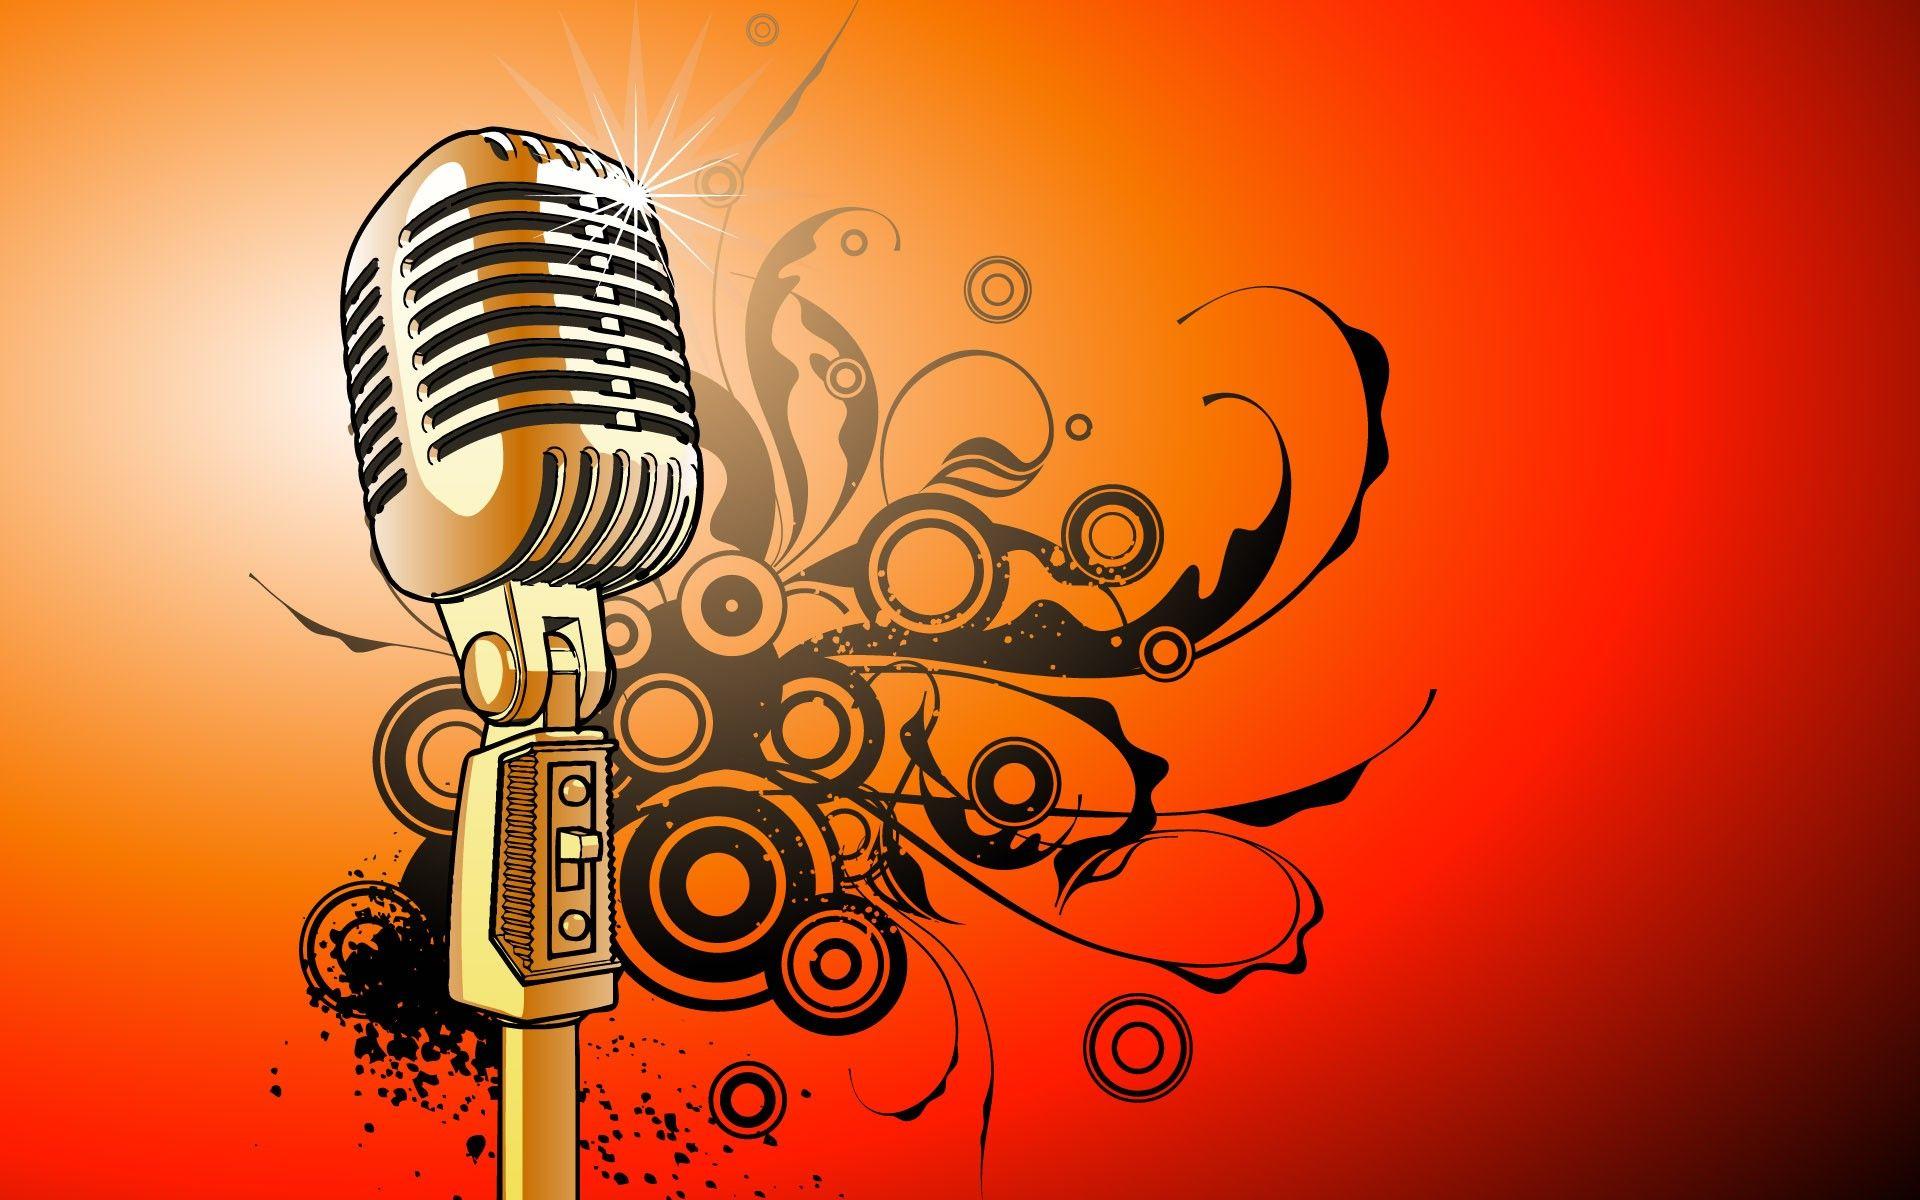 Microphone Selection Music Art Music Wallpaper Music Artwork